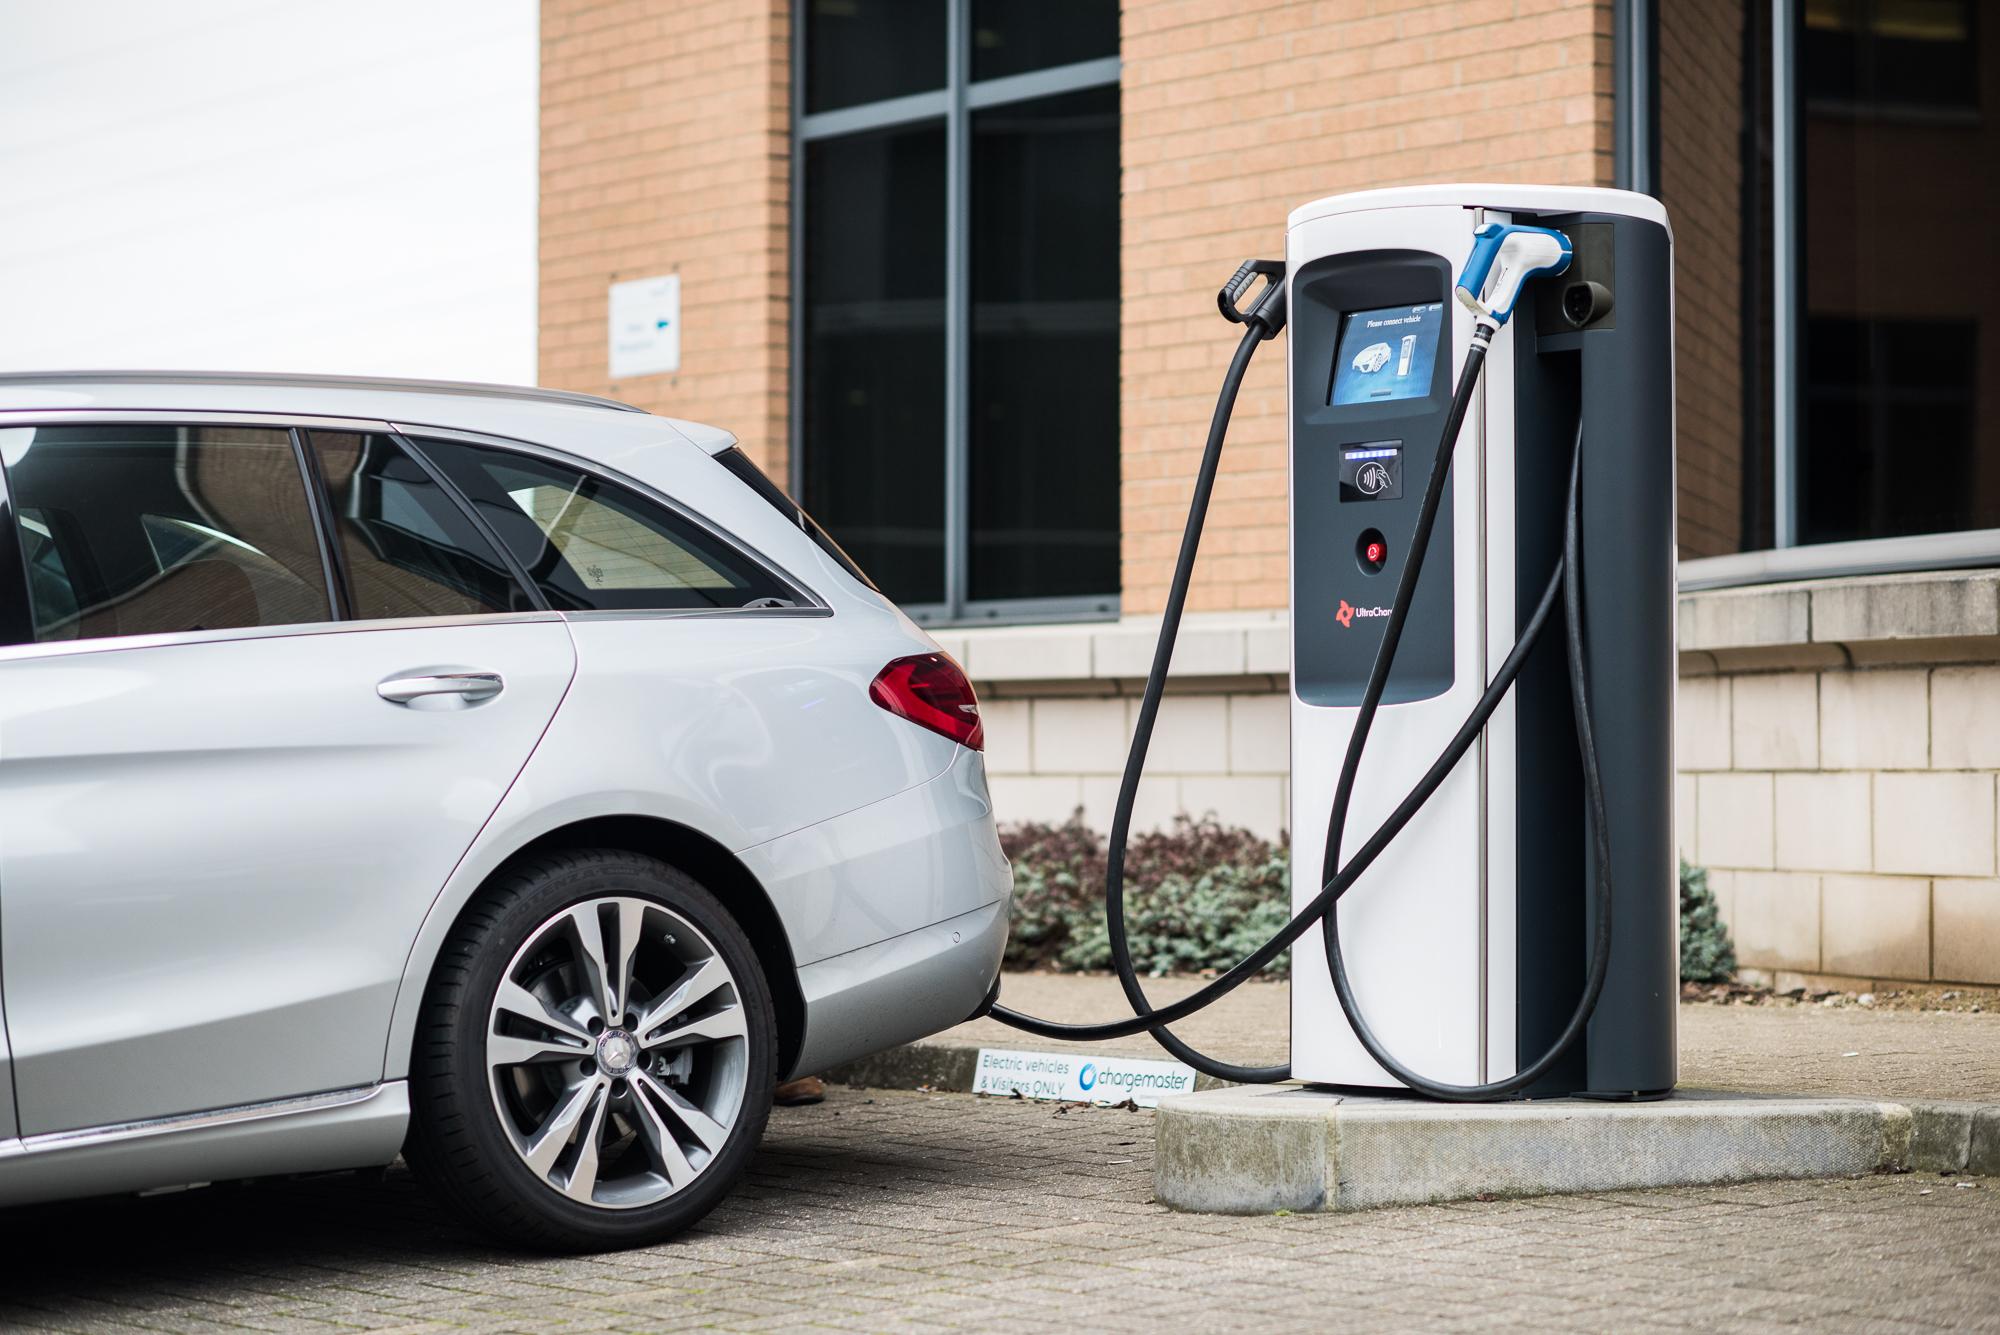 Chargemaster partnership provides Cenex LCV2017 charging points